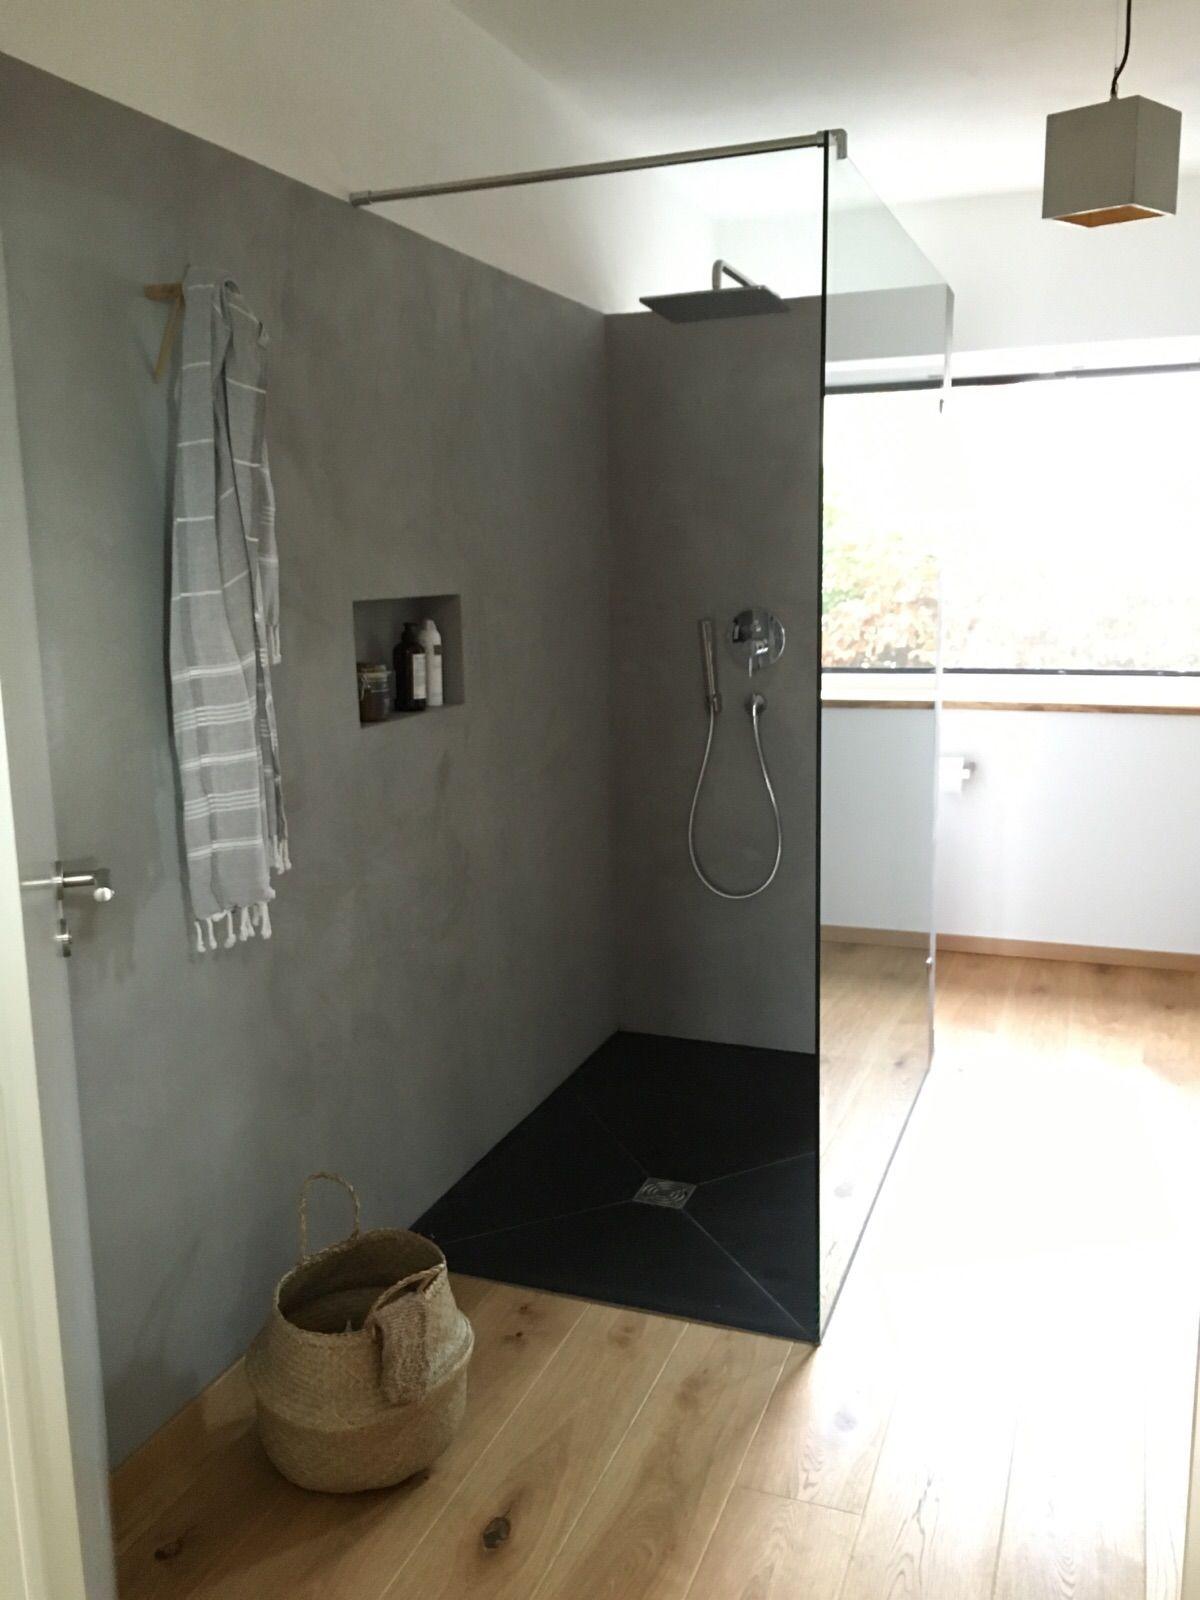 beton ciré: tolle ideen mit dem effektputz in betonoptik